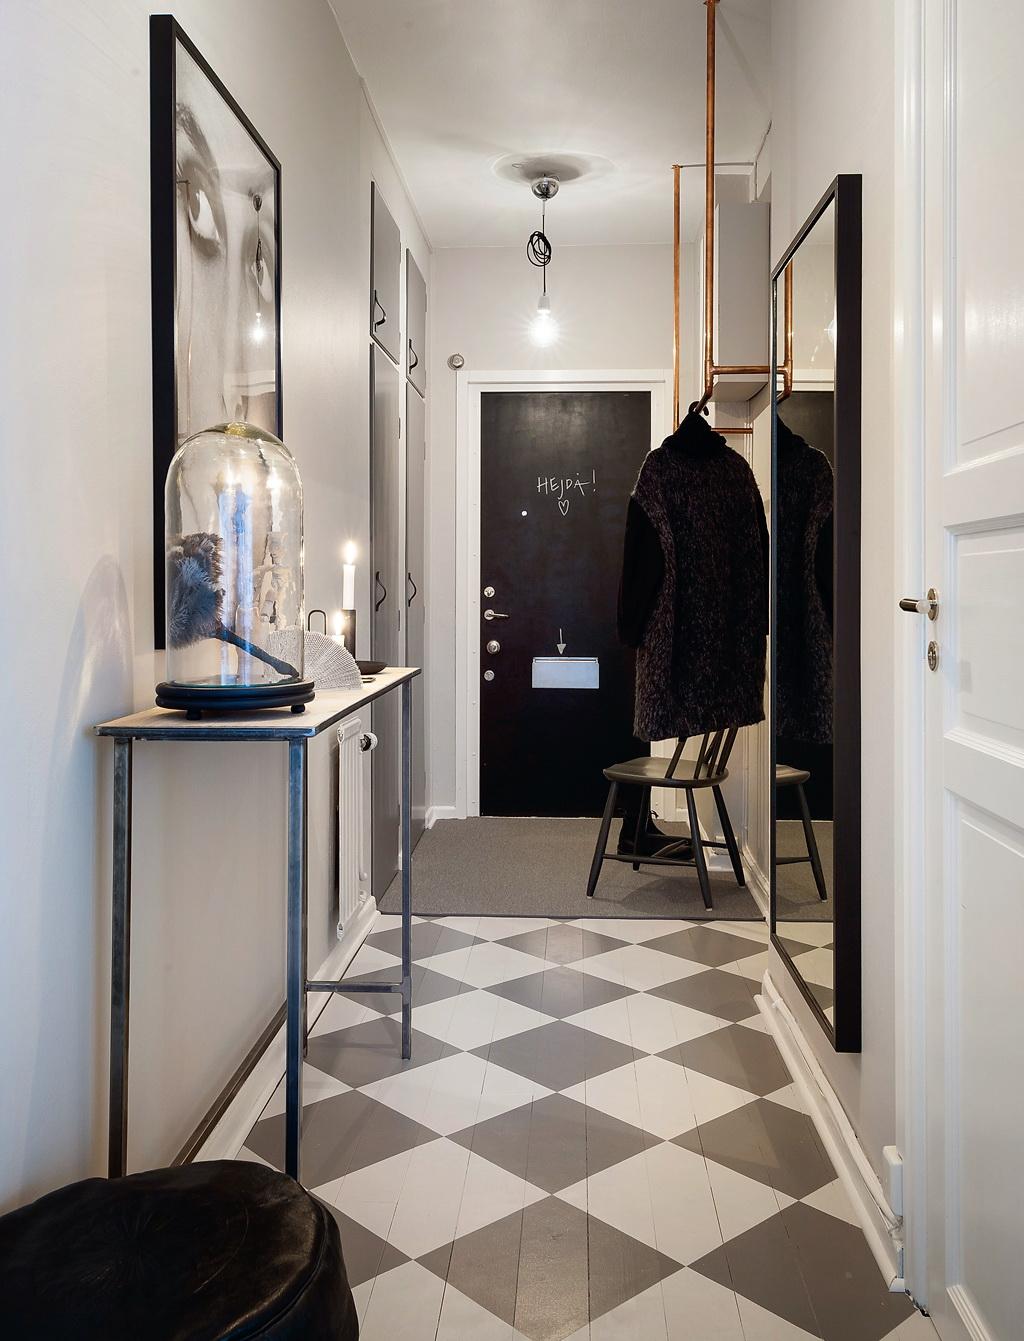 Fabuleux Pellmell Créations: Un appartement hollandais en noir et blanc XA49